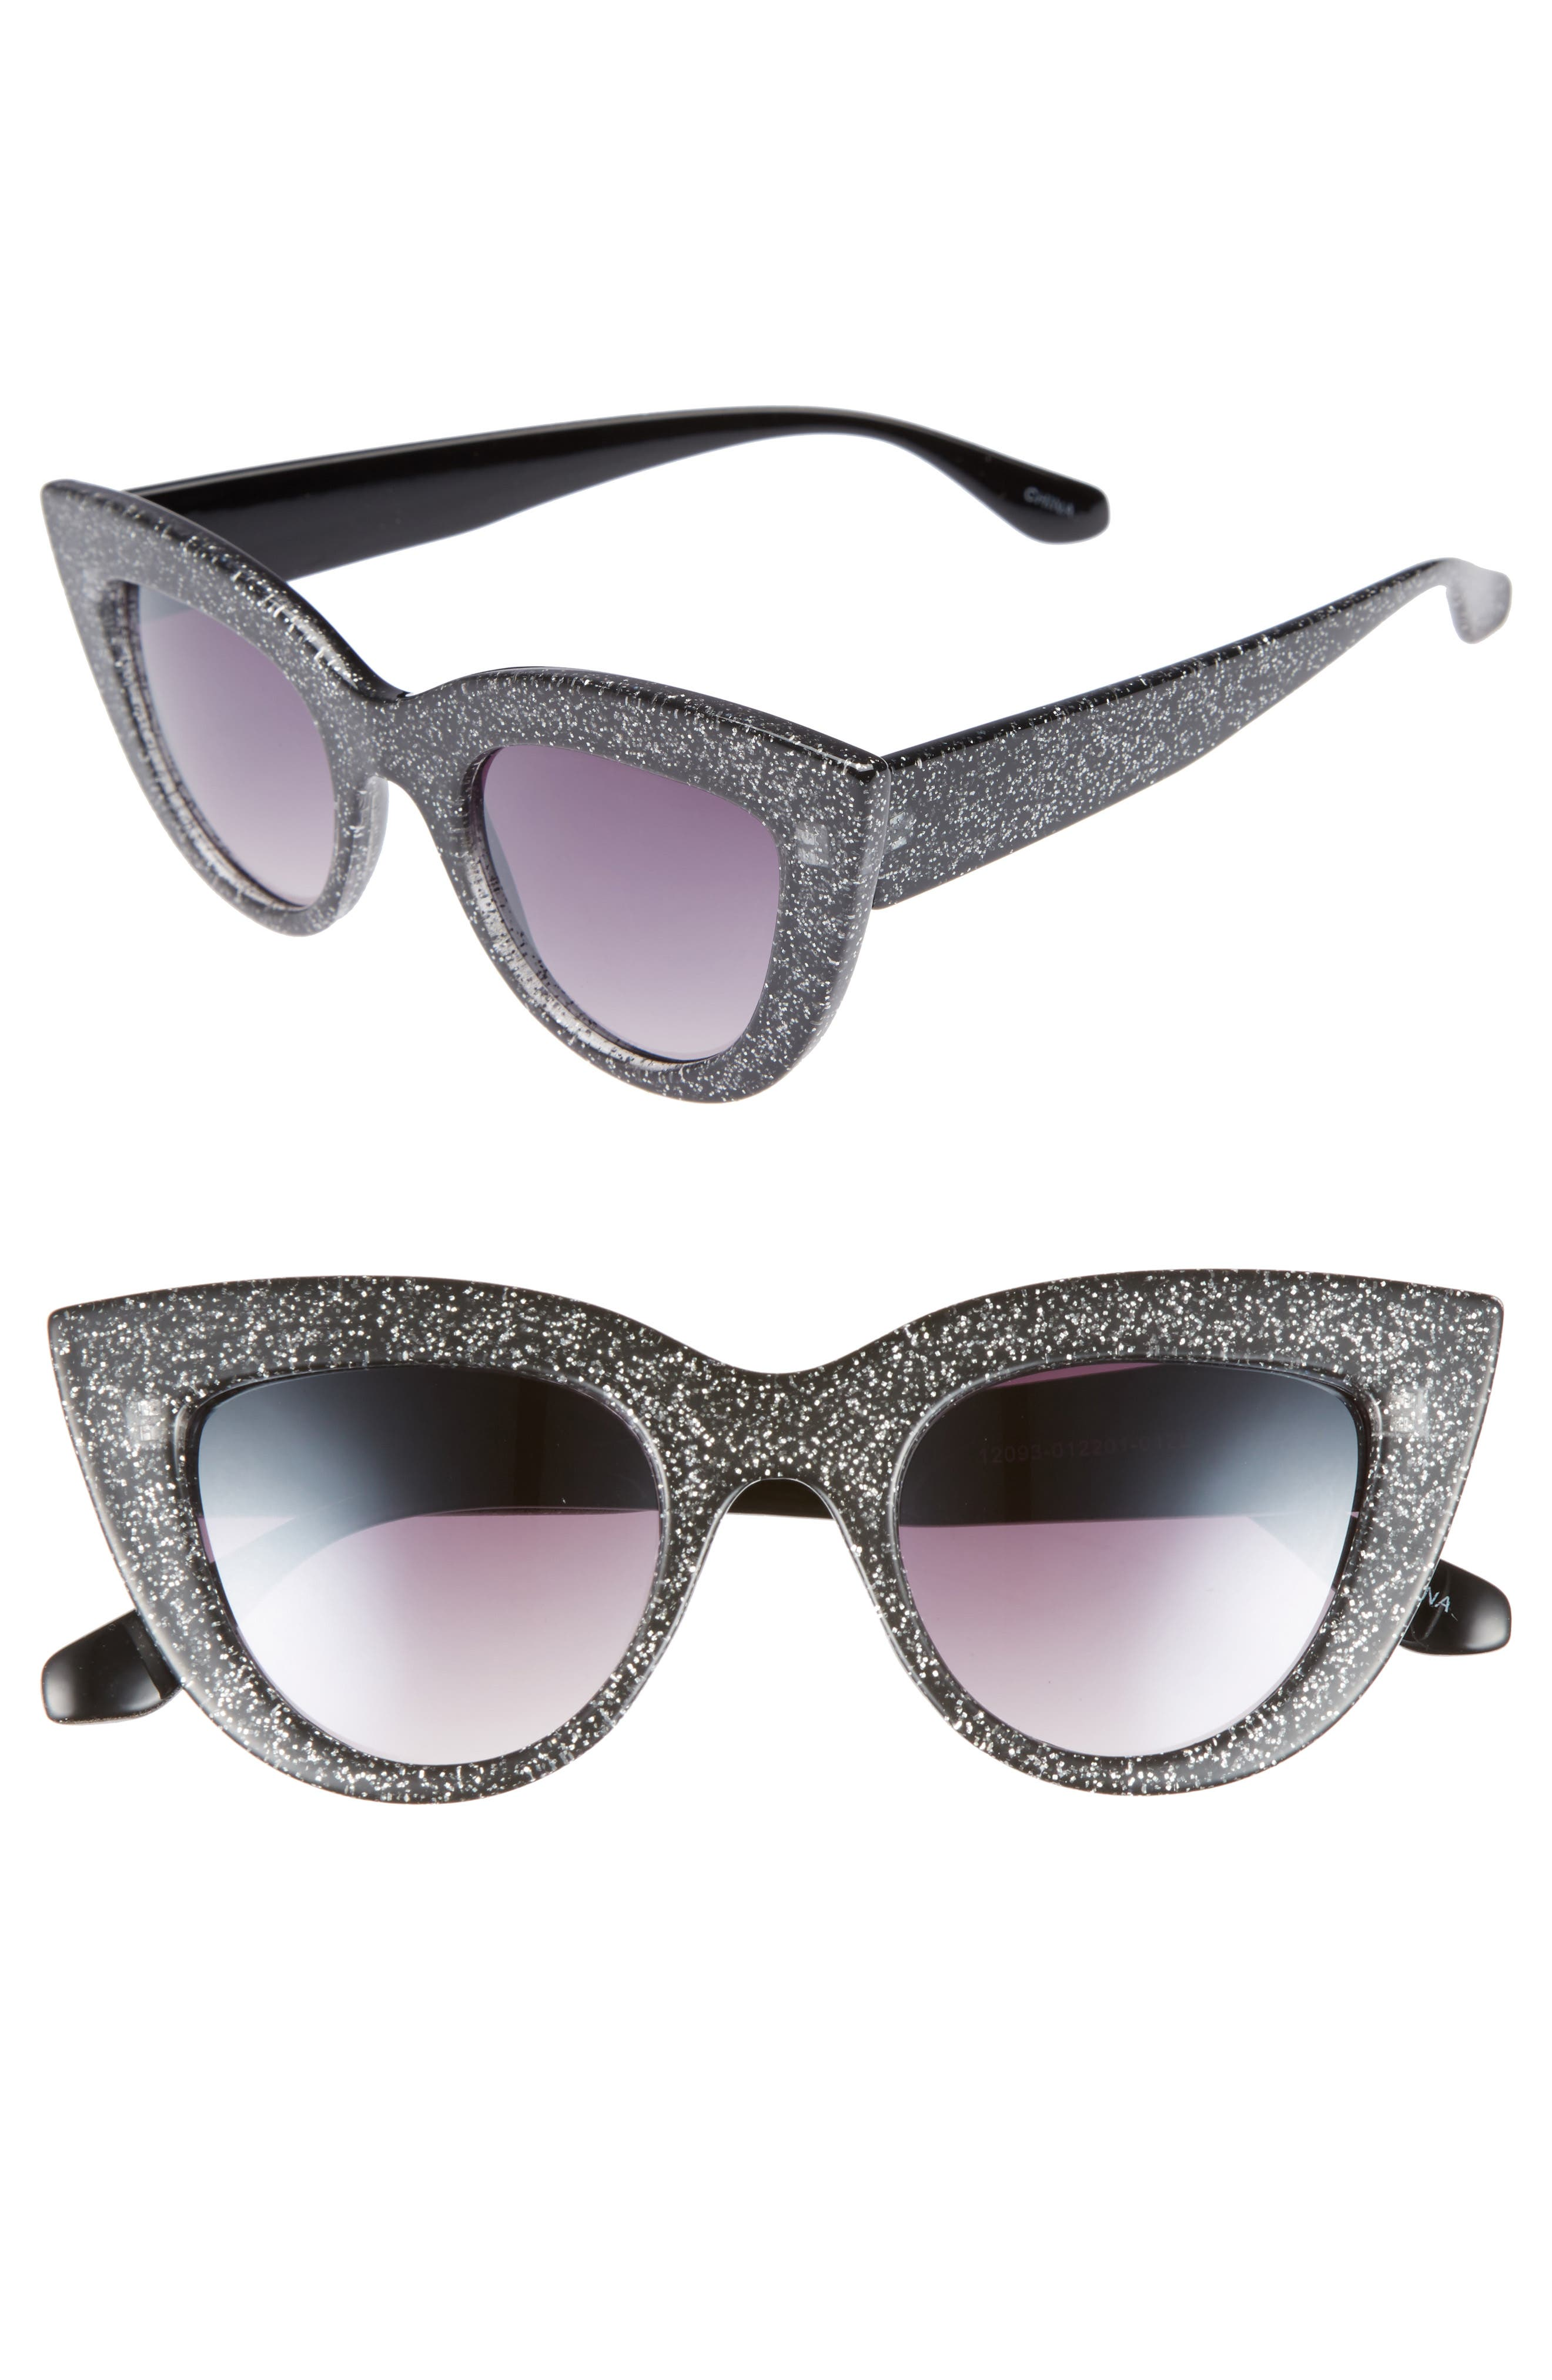 45mm Glitter Cat Eye Sunglasses,                         Main,                         color, Black/ Silver